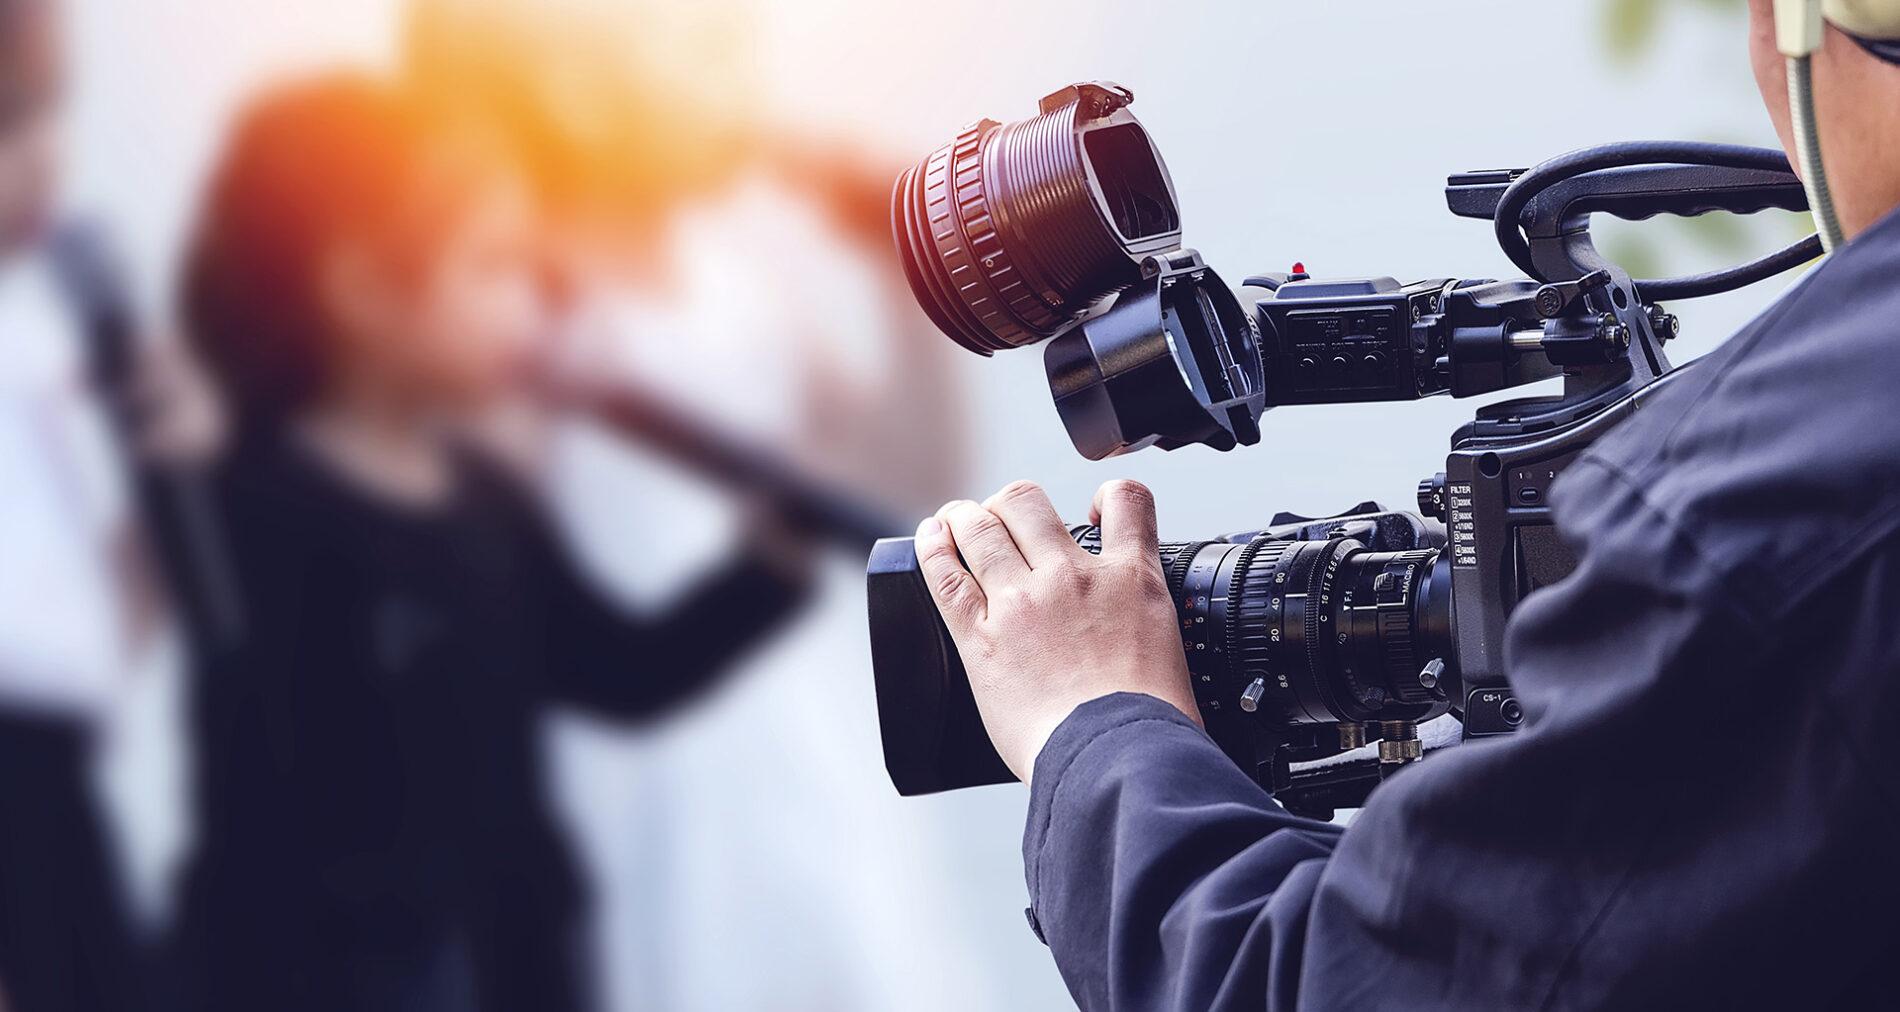 Sai Guru Photography & Videography